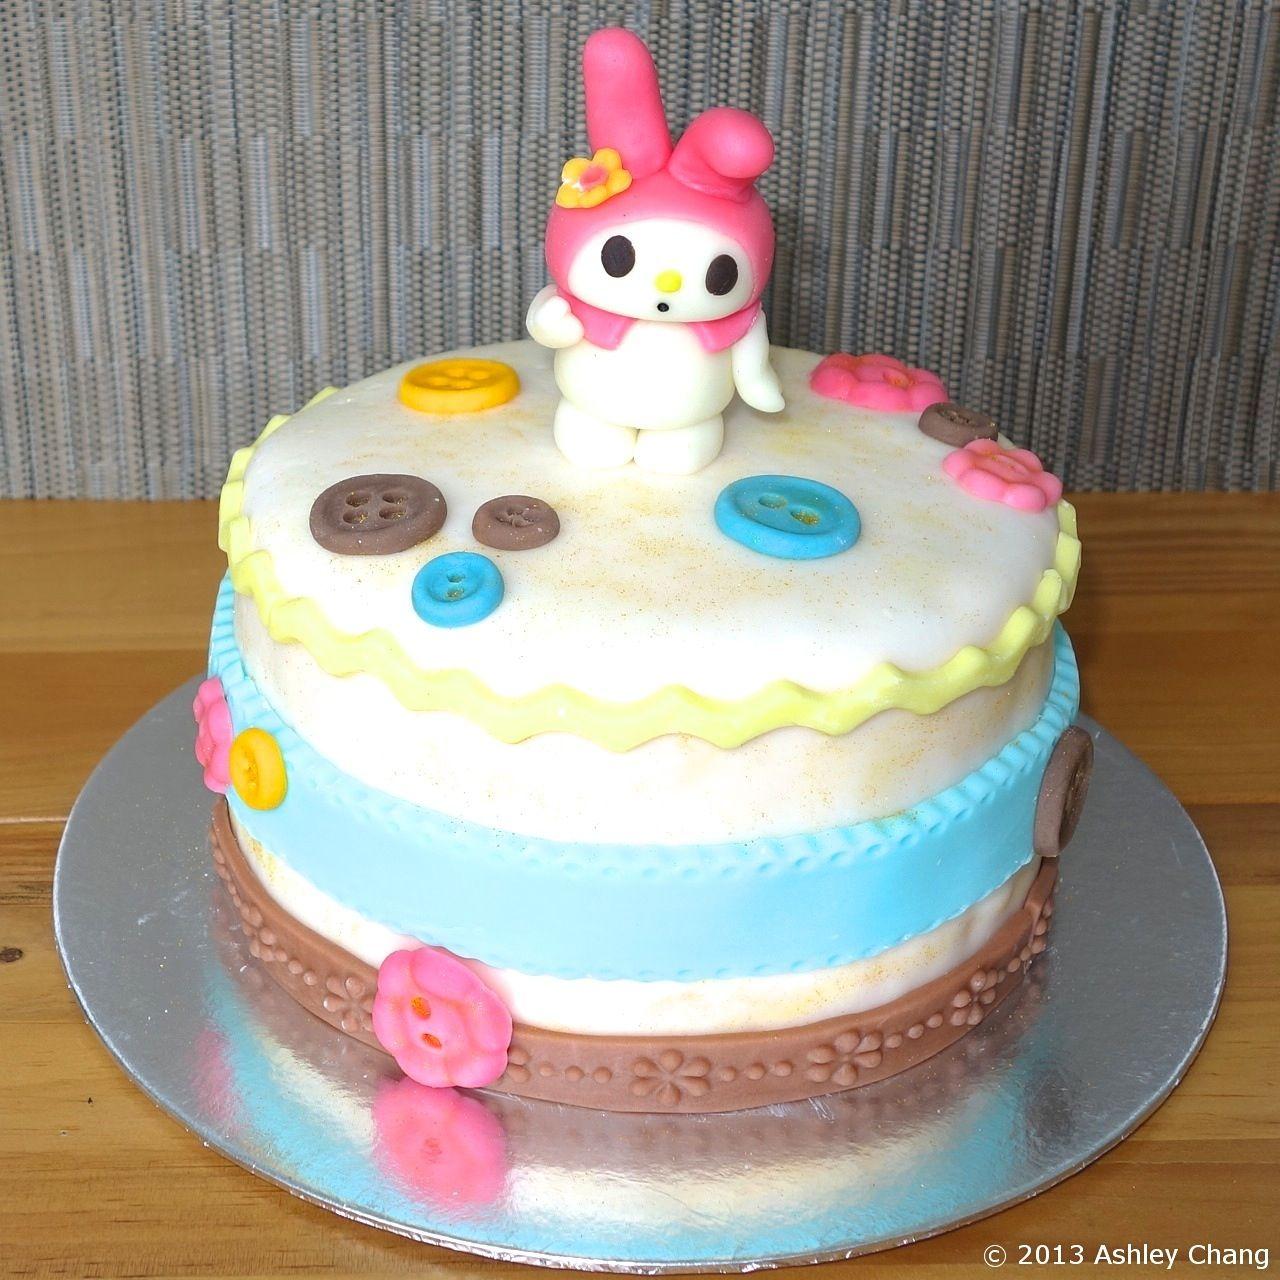 Ashley Milton Keynes Escort cake from ashley's atelier. cute as a button melody